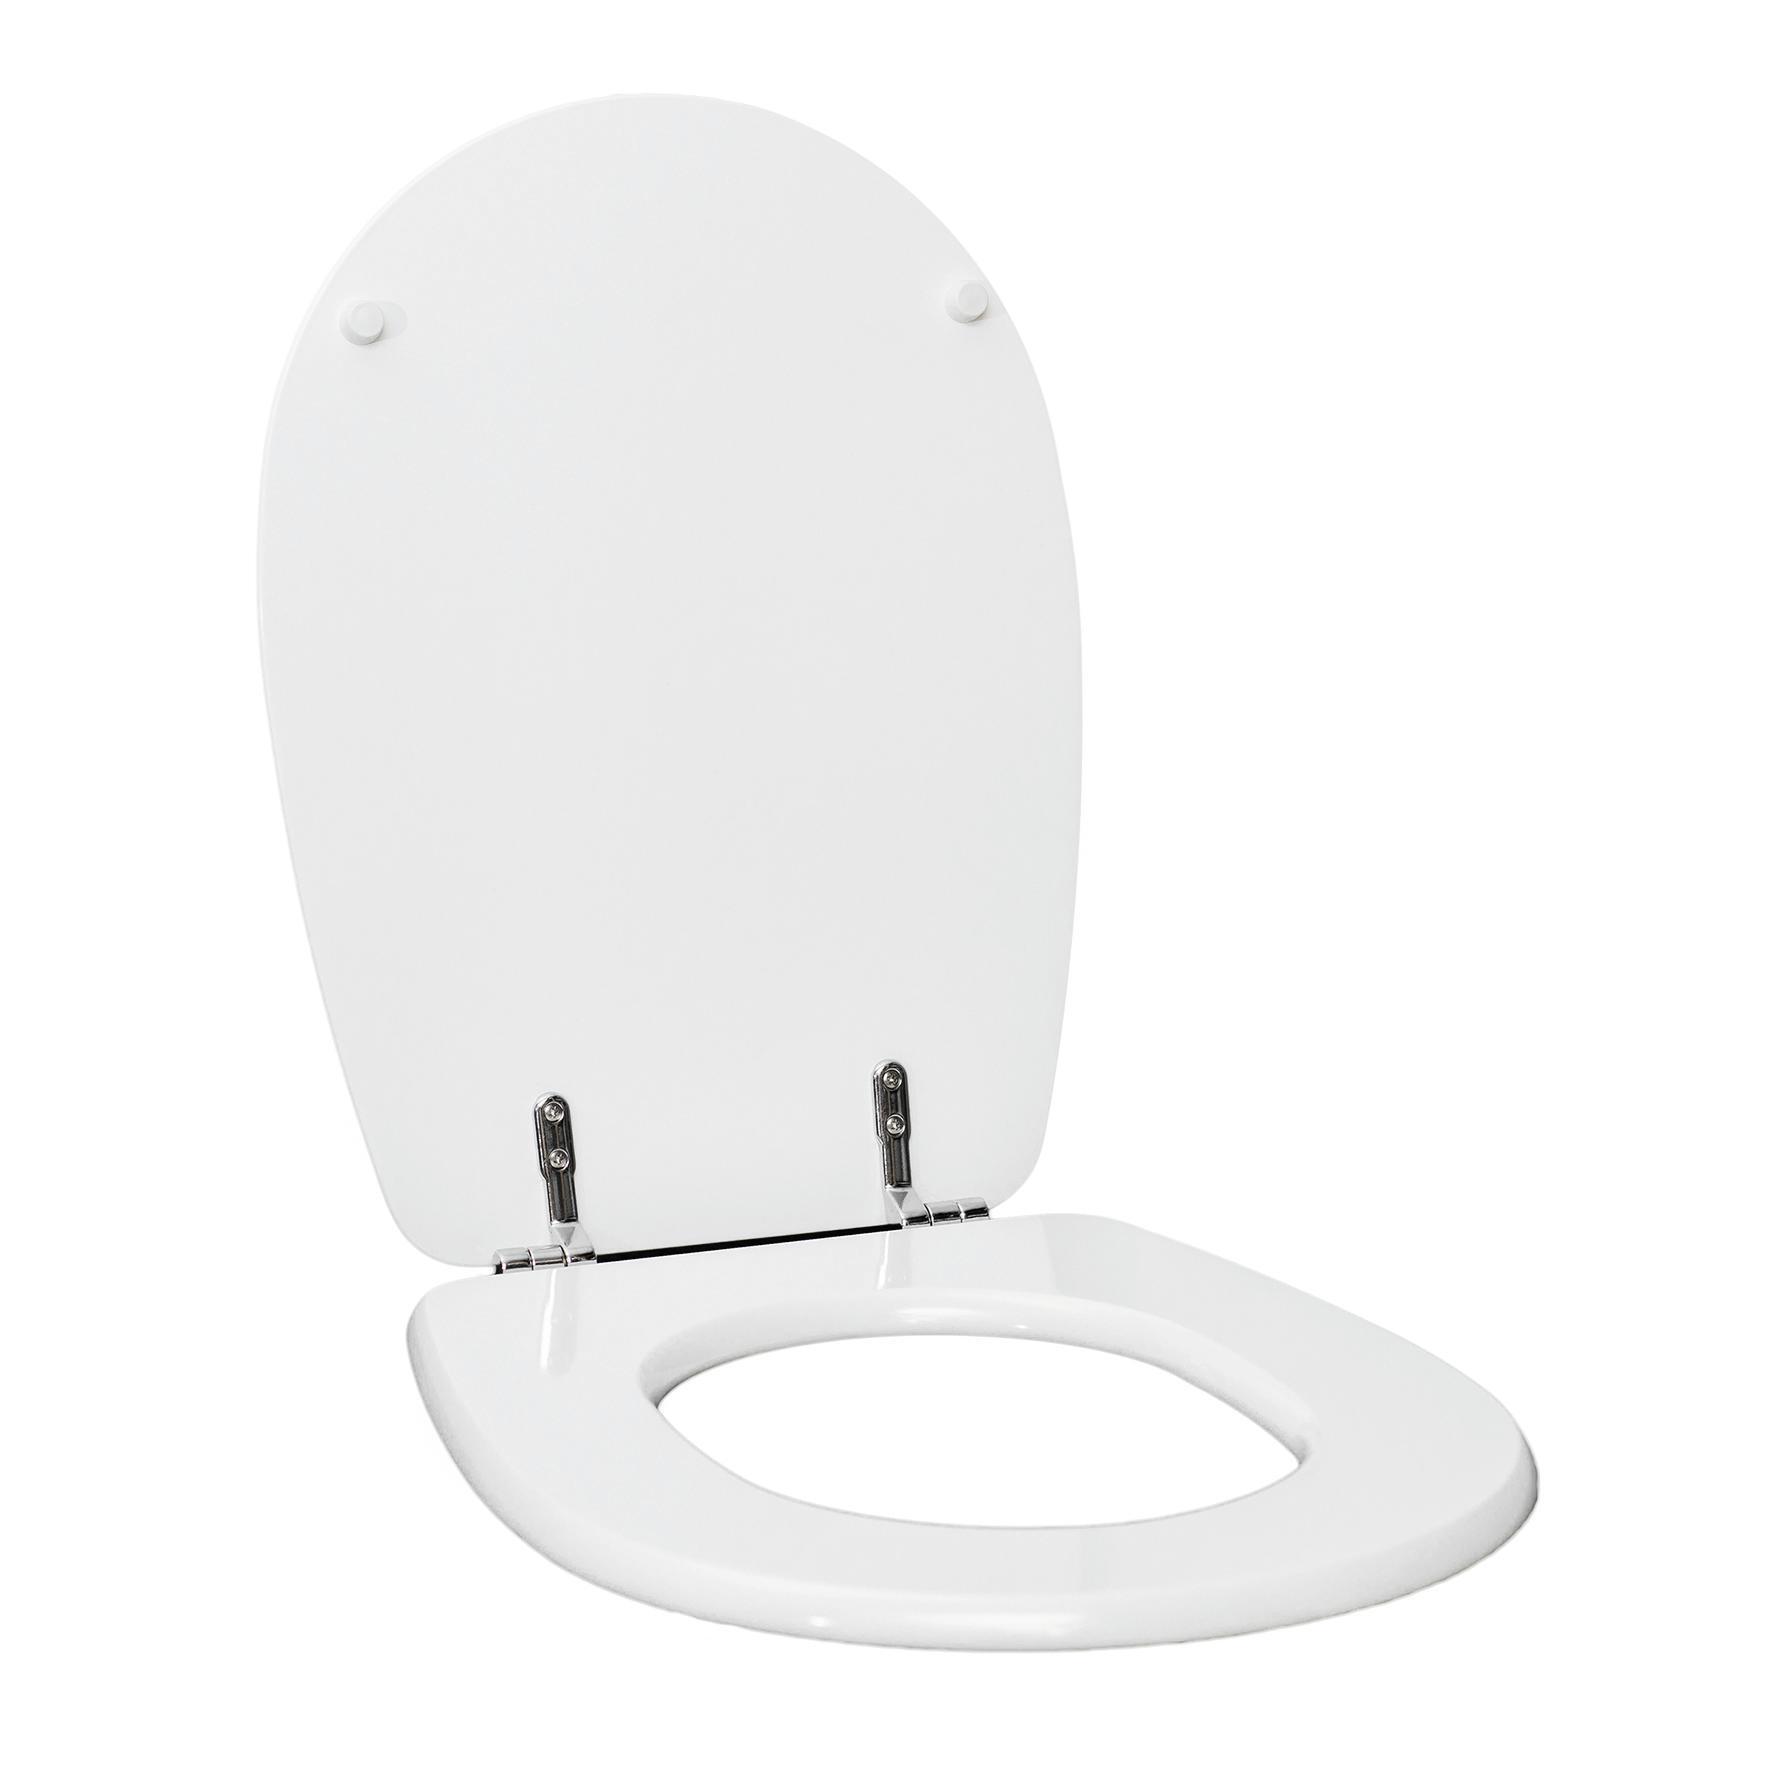 Copriwater ovale Universale Liuto mdf bianco - 3